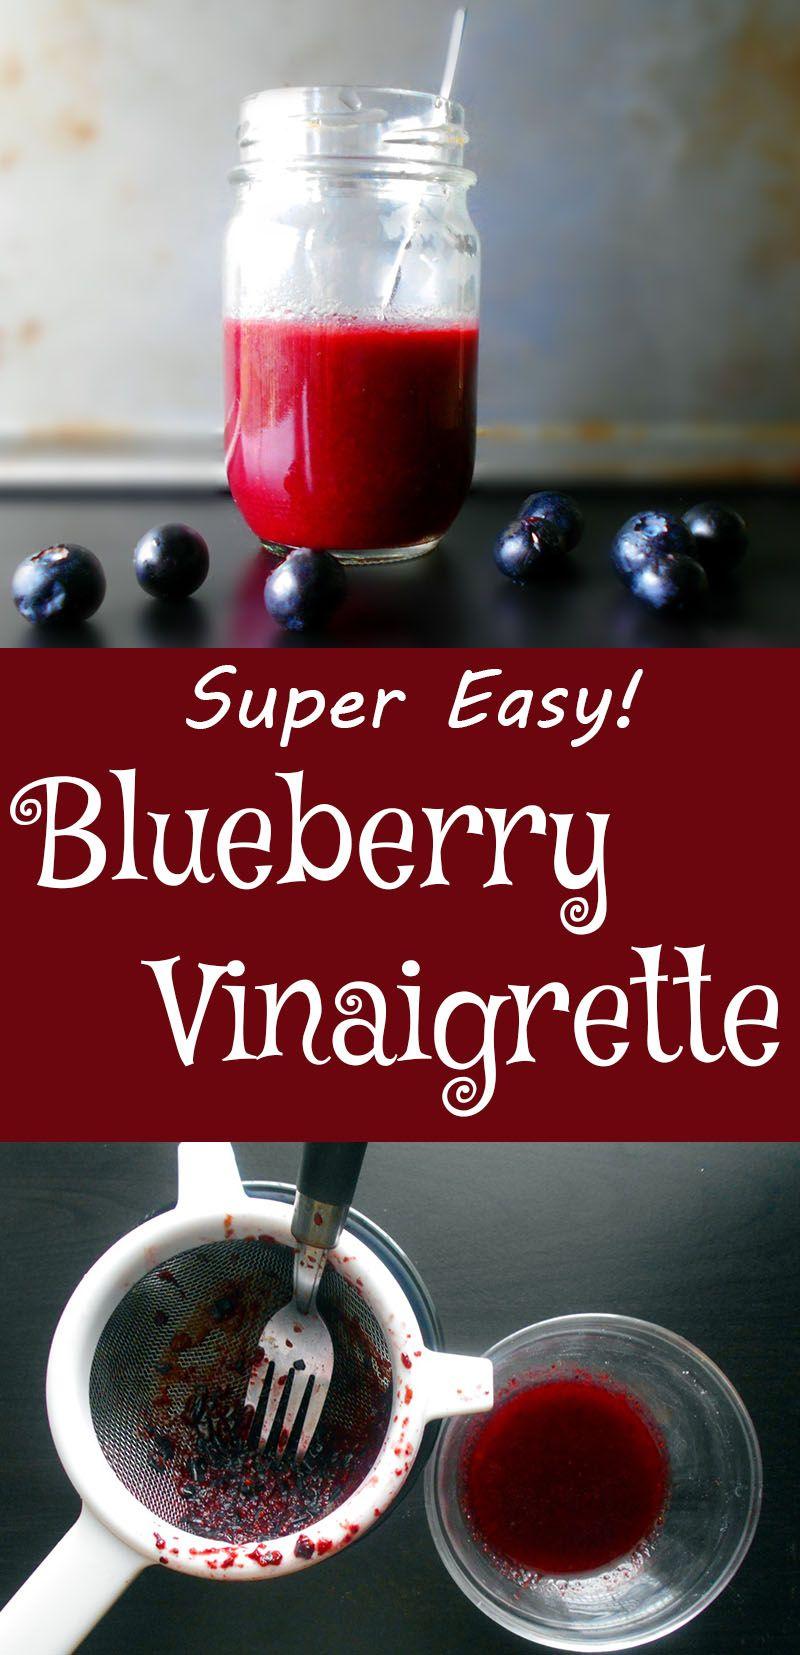 Blueberry Vinaigrette Recipe Healing Tomato Recipes Recipe Blueberry Vinaigrette Vinaigrette Recipes Vinaigrette